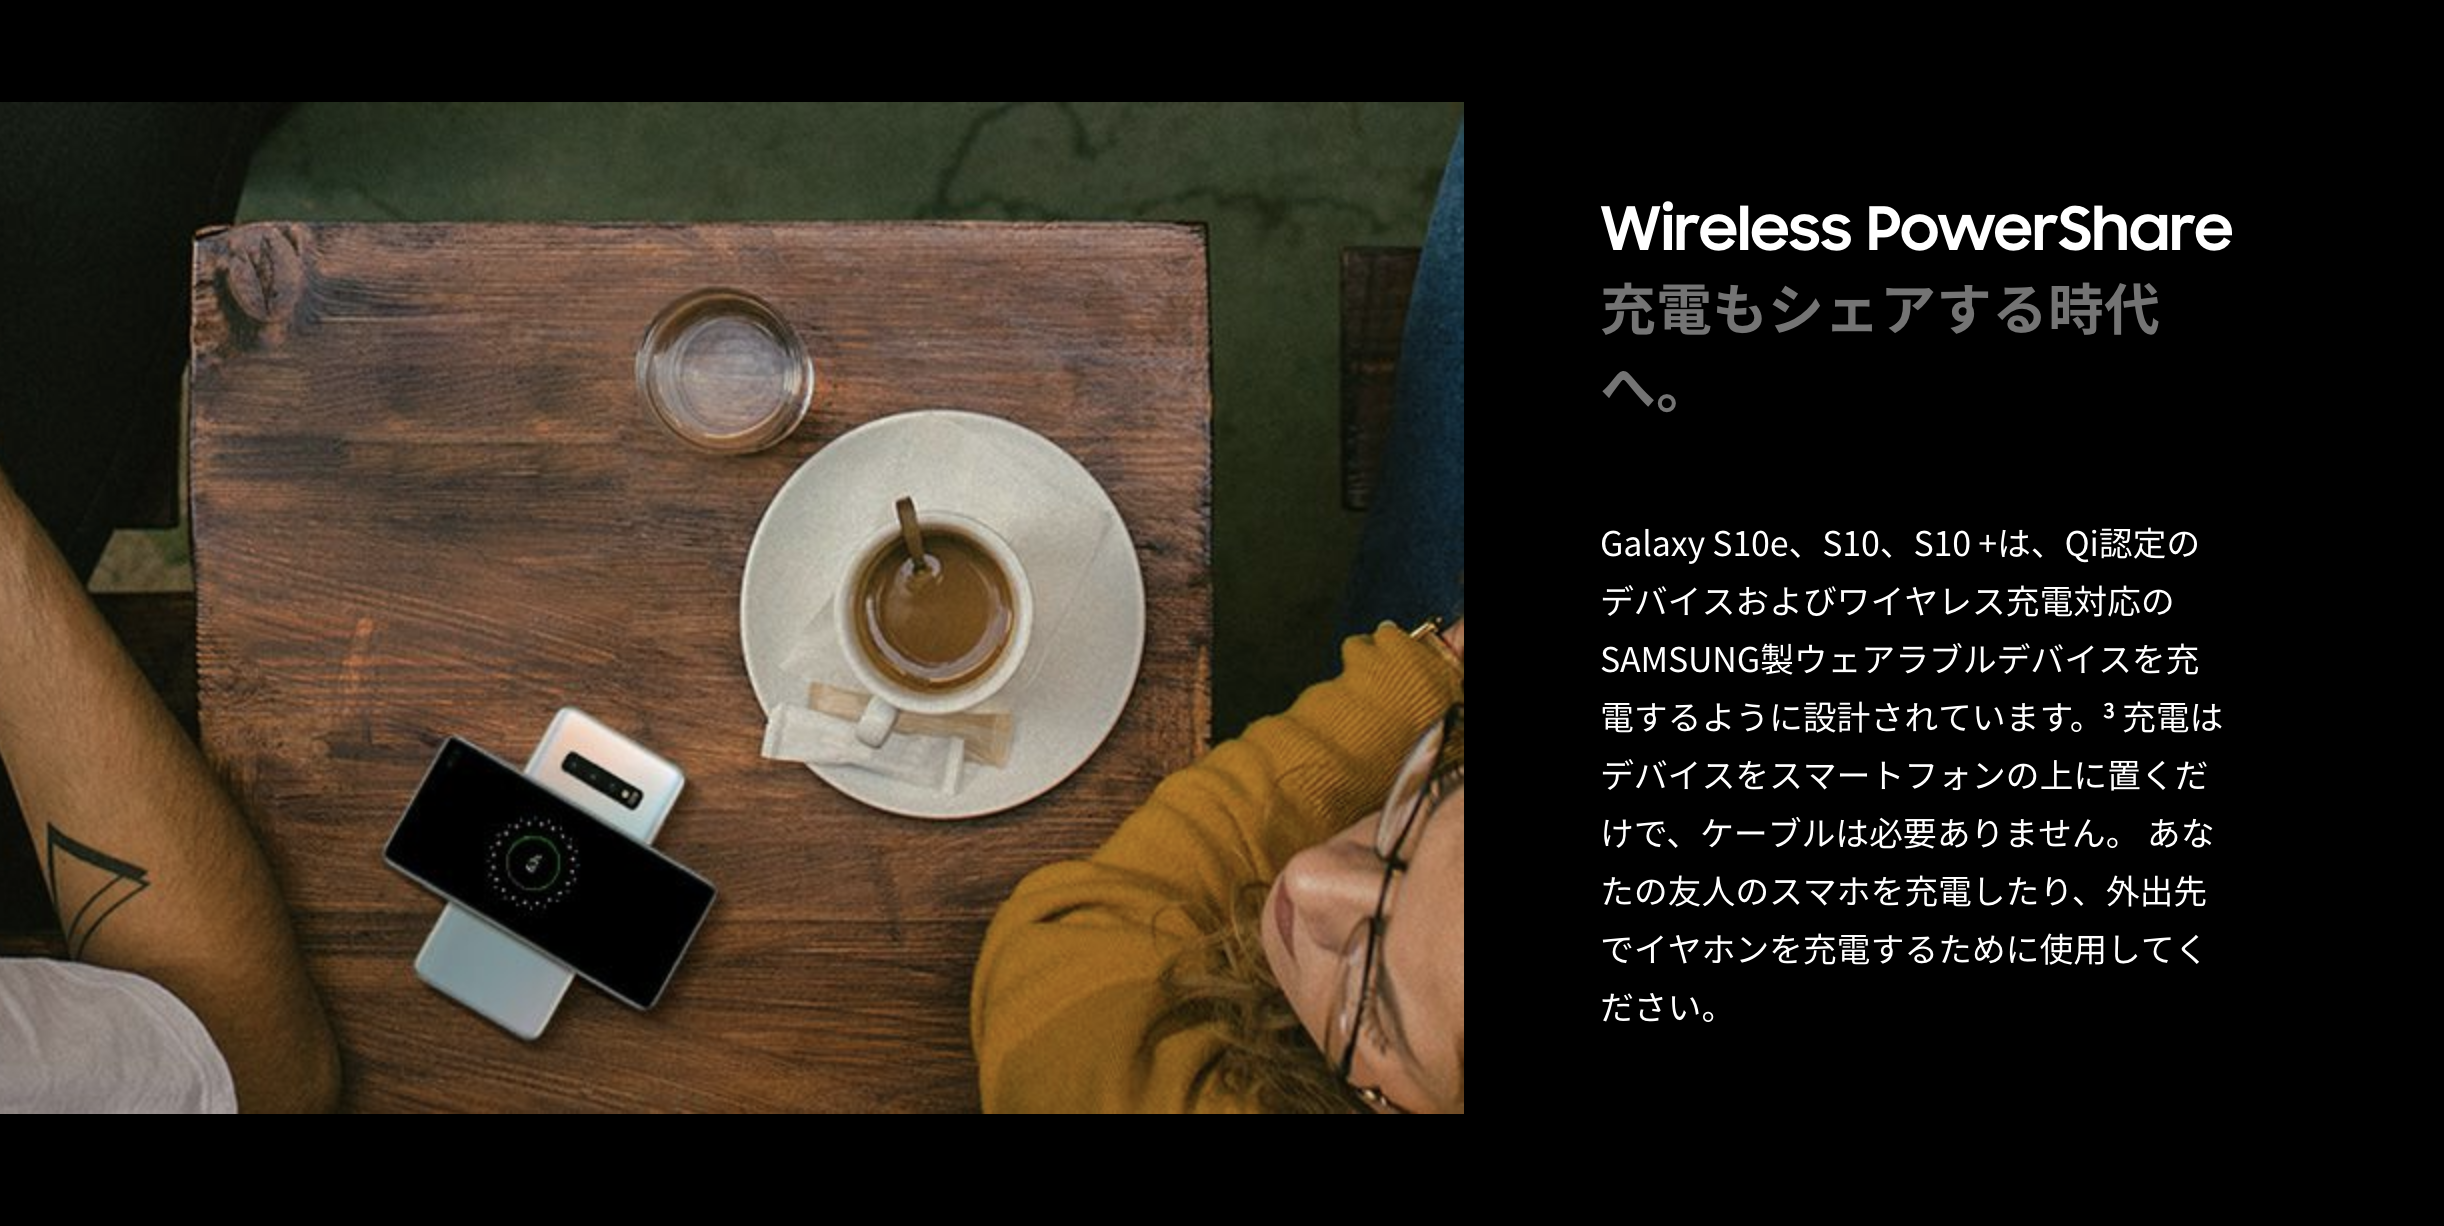 Wireless Power Share image